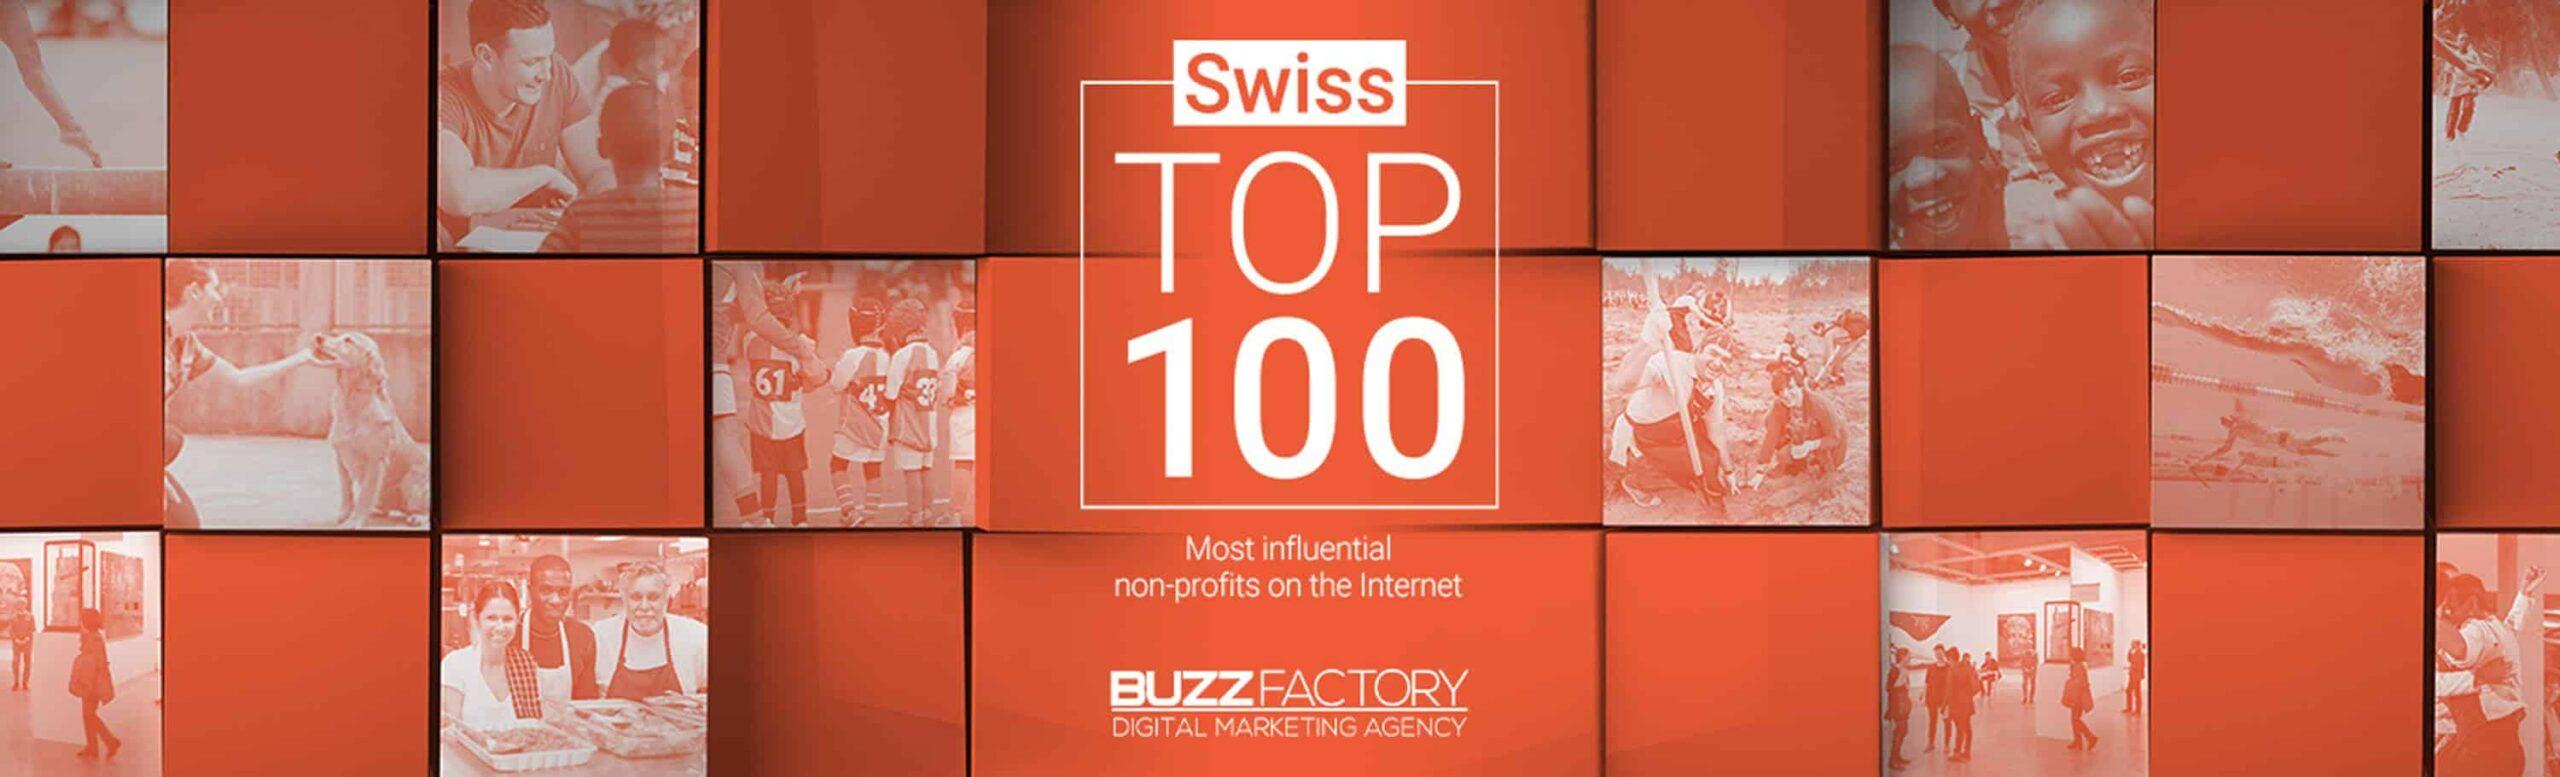 top 100 nonprofits on the internet